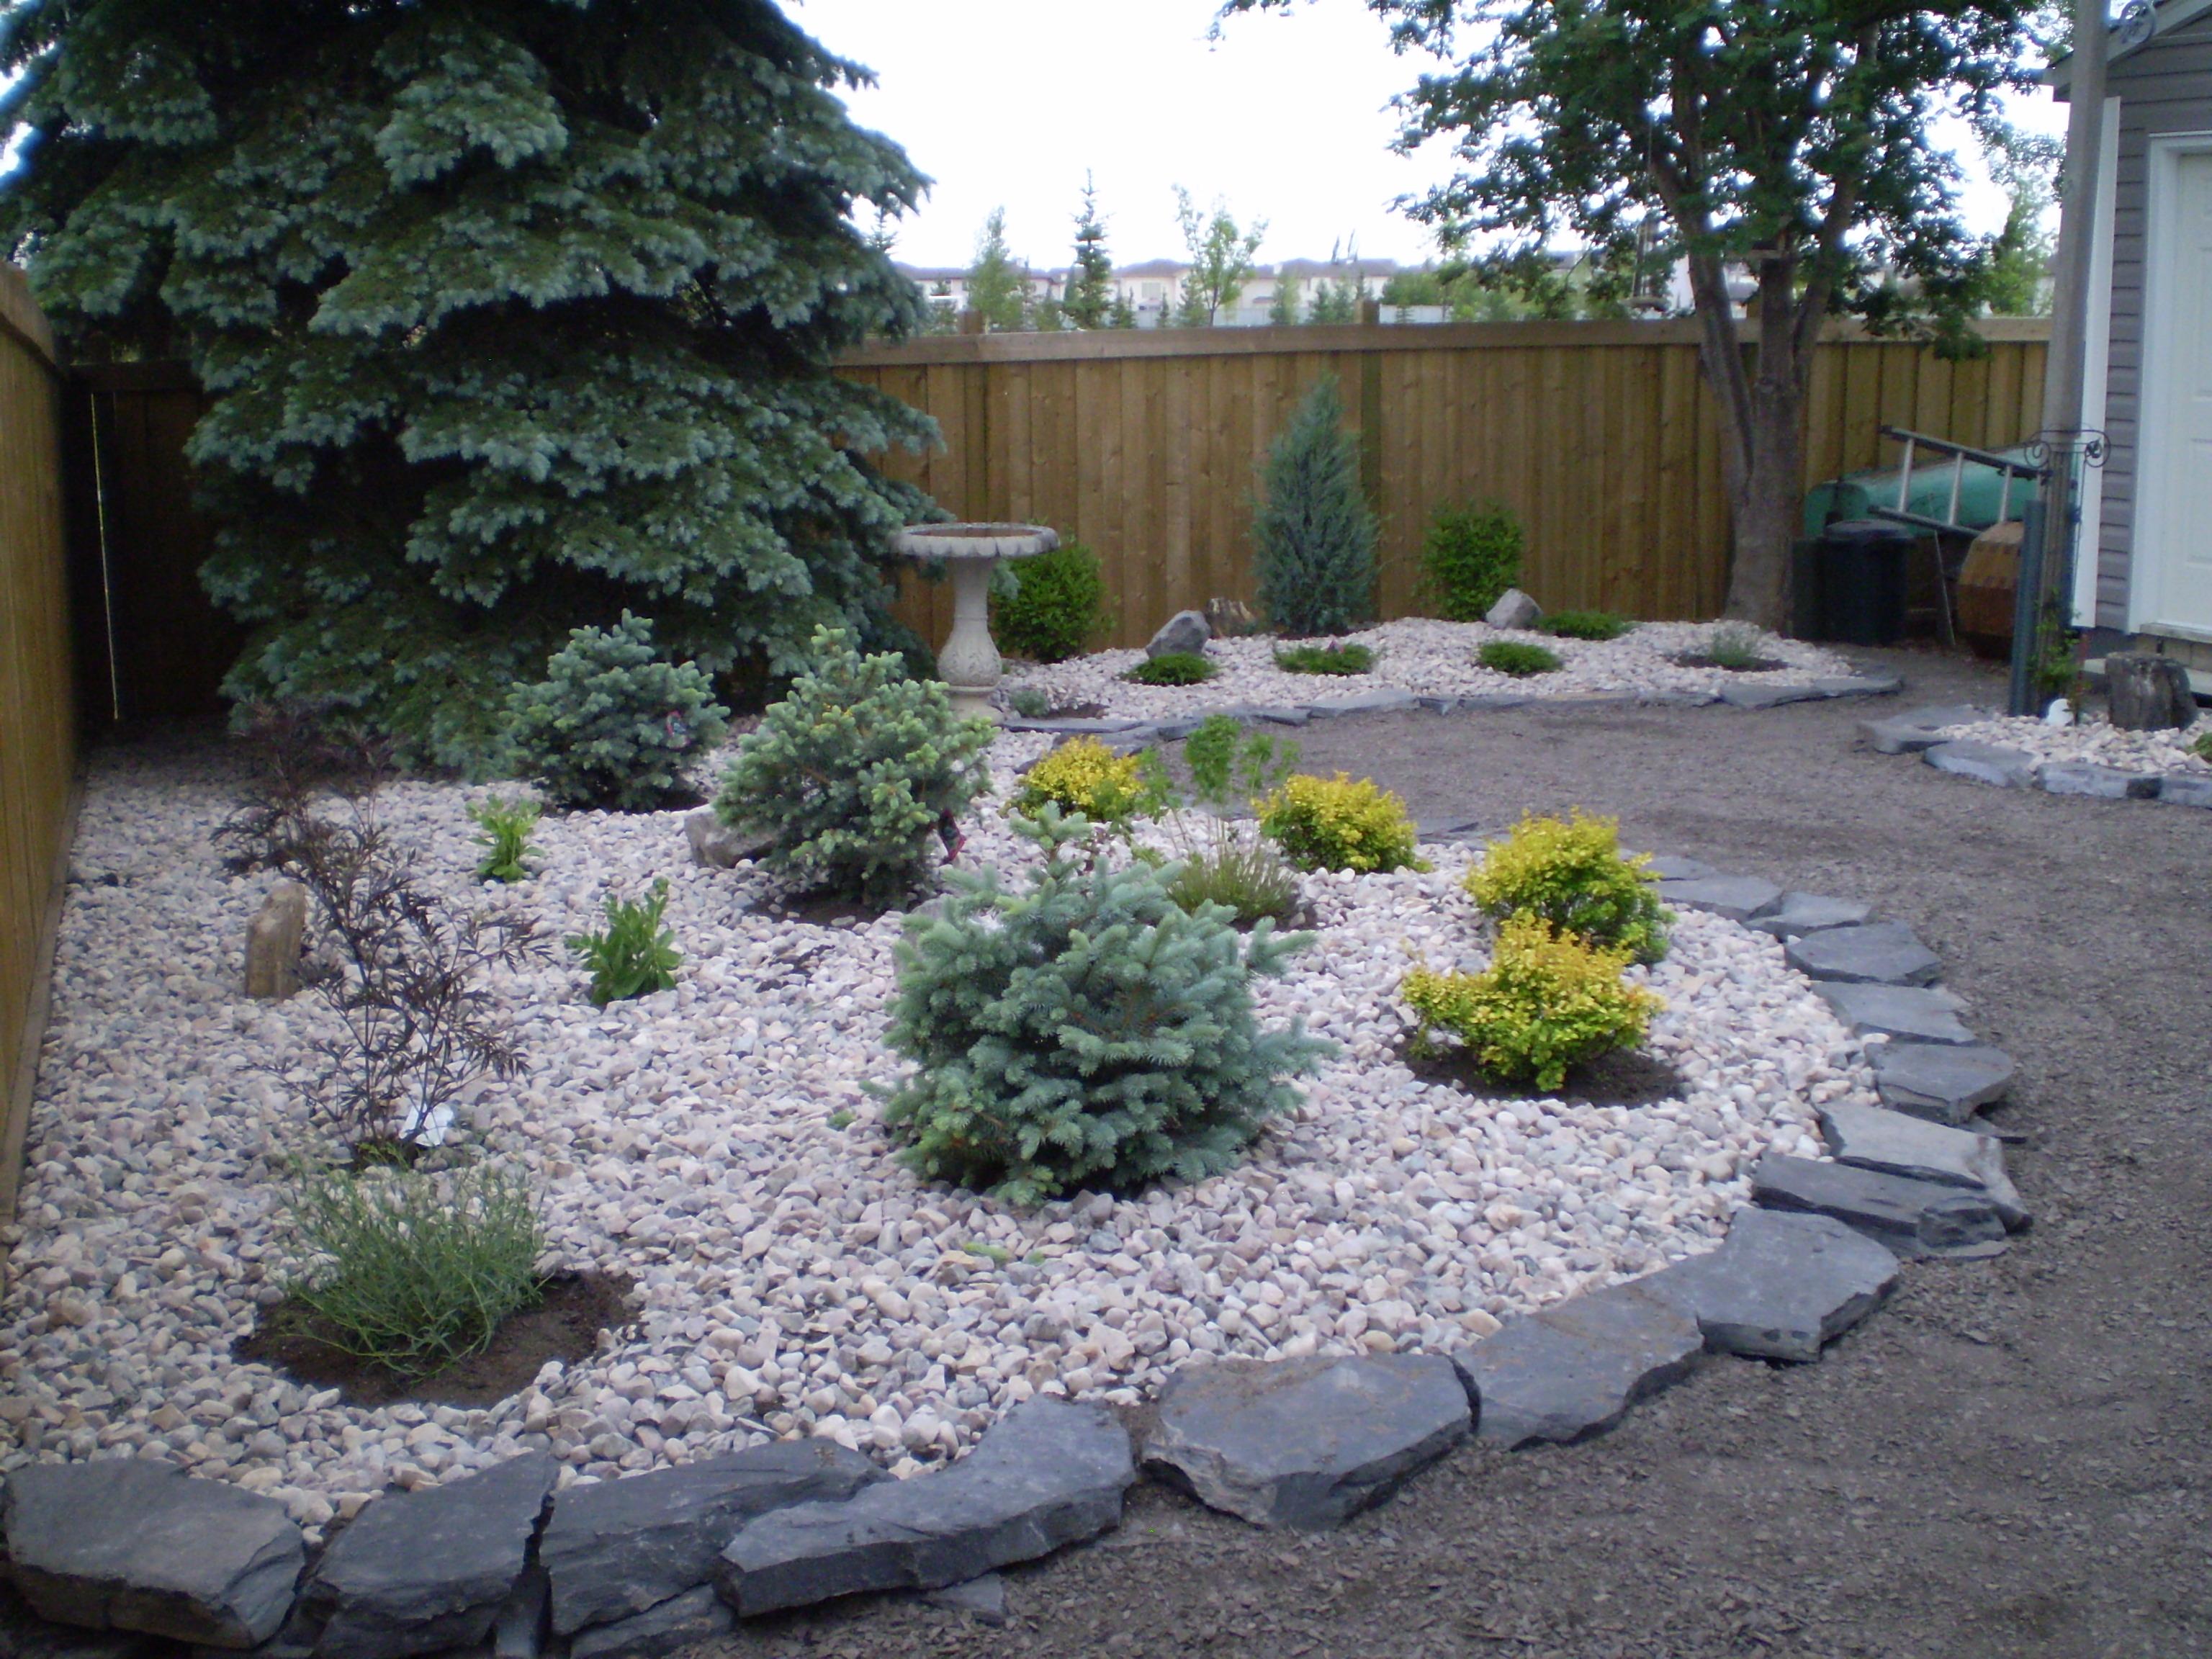 Low Maintenance Backyard Landscaping - Landscape Ideas on Low Maintenance Backyard Design  id=31987